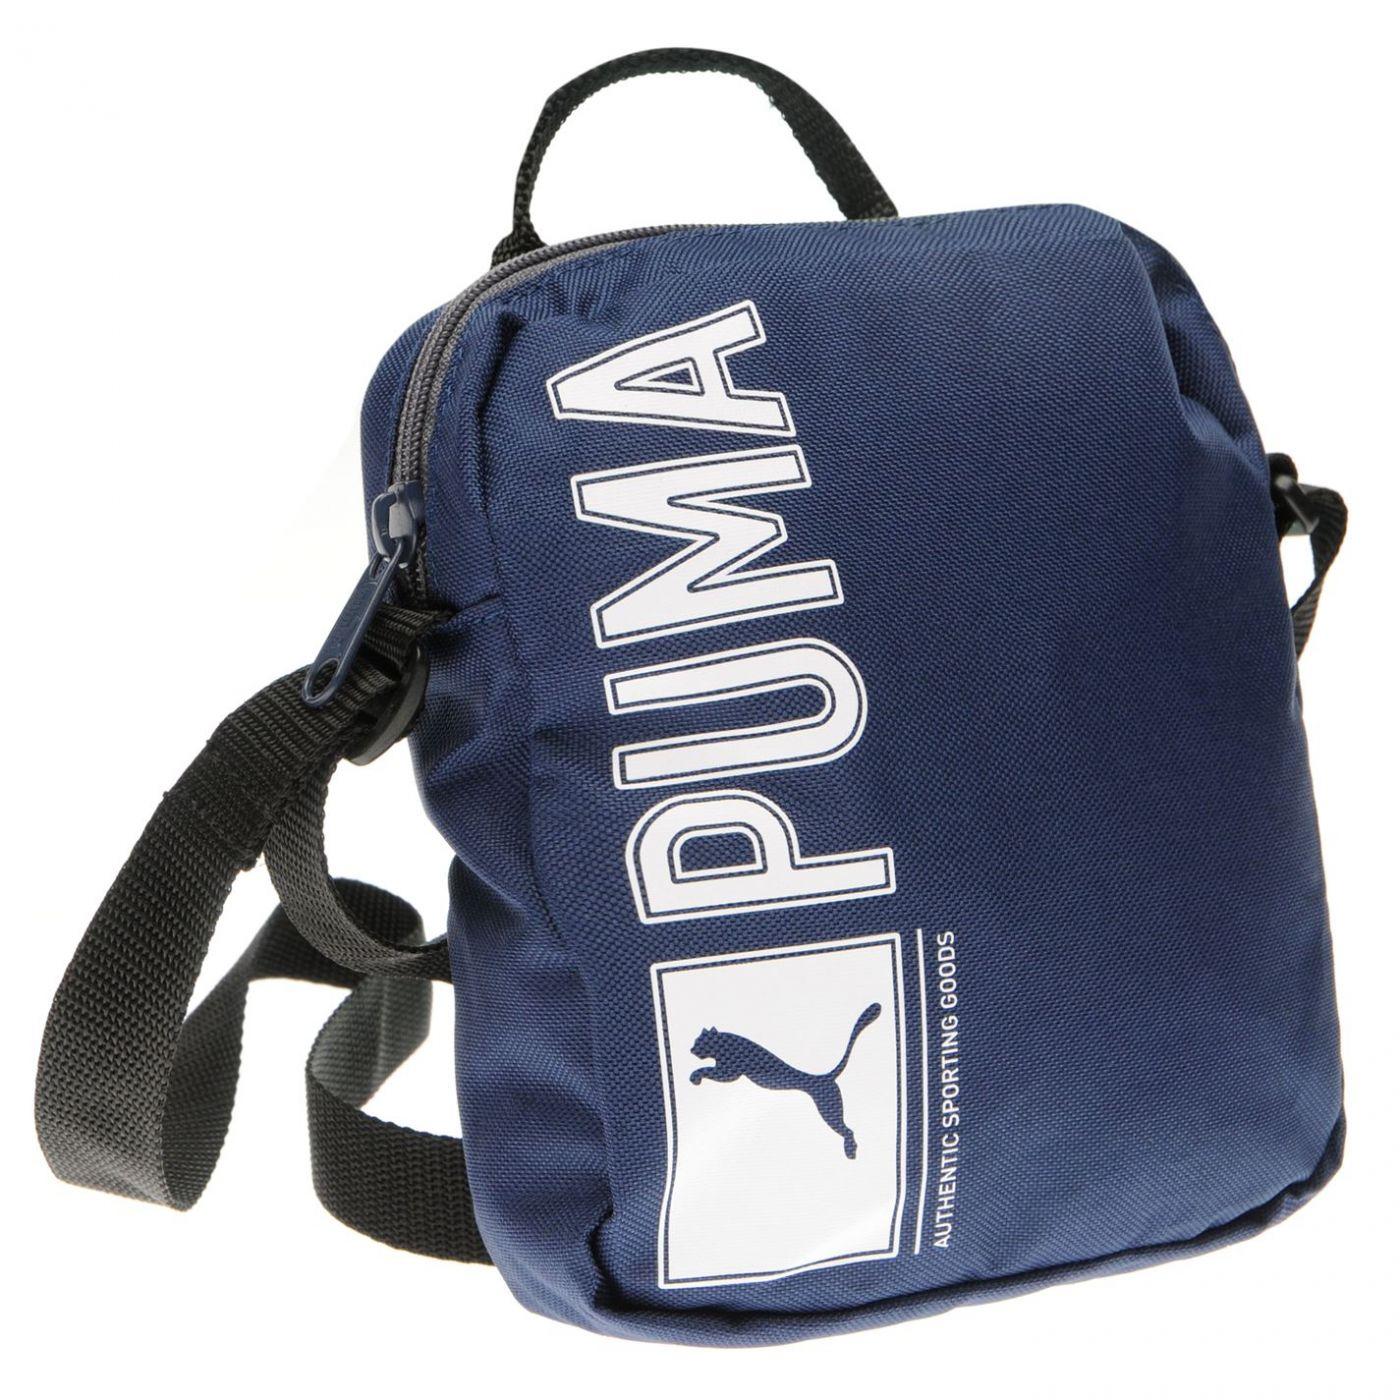 Puma Pioneer Portable Organiser Bag